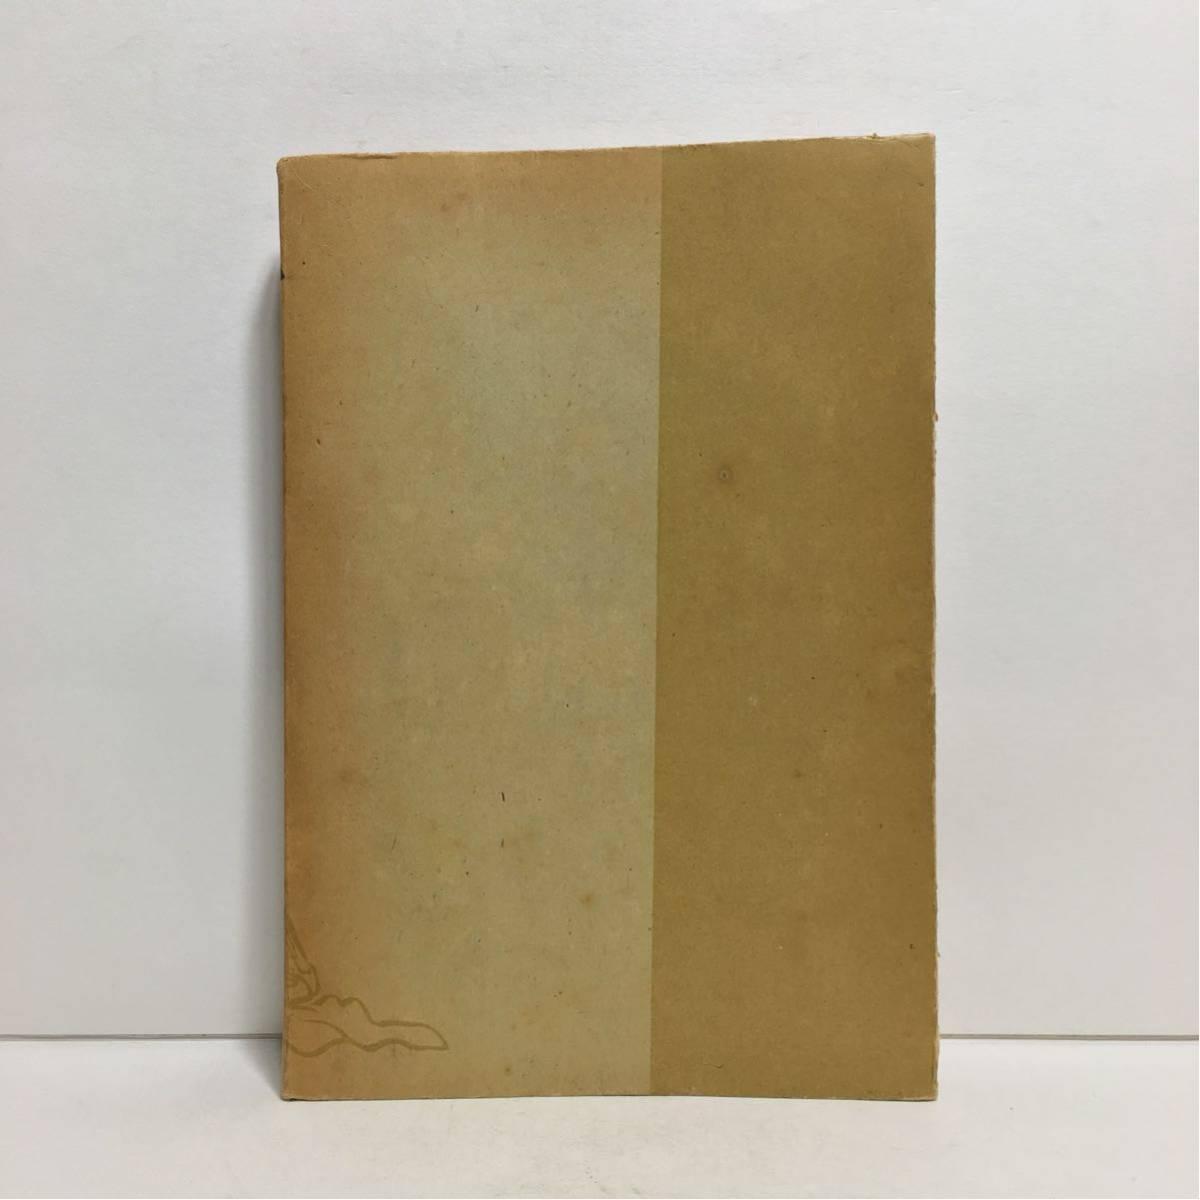 c4/孔子 室伏高信著 潮文閣 昭和21年初版 ゆうメール送料180円_画像3